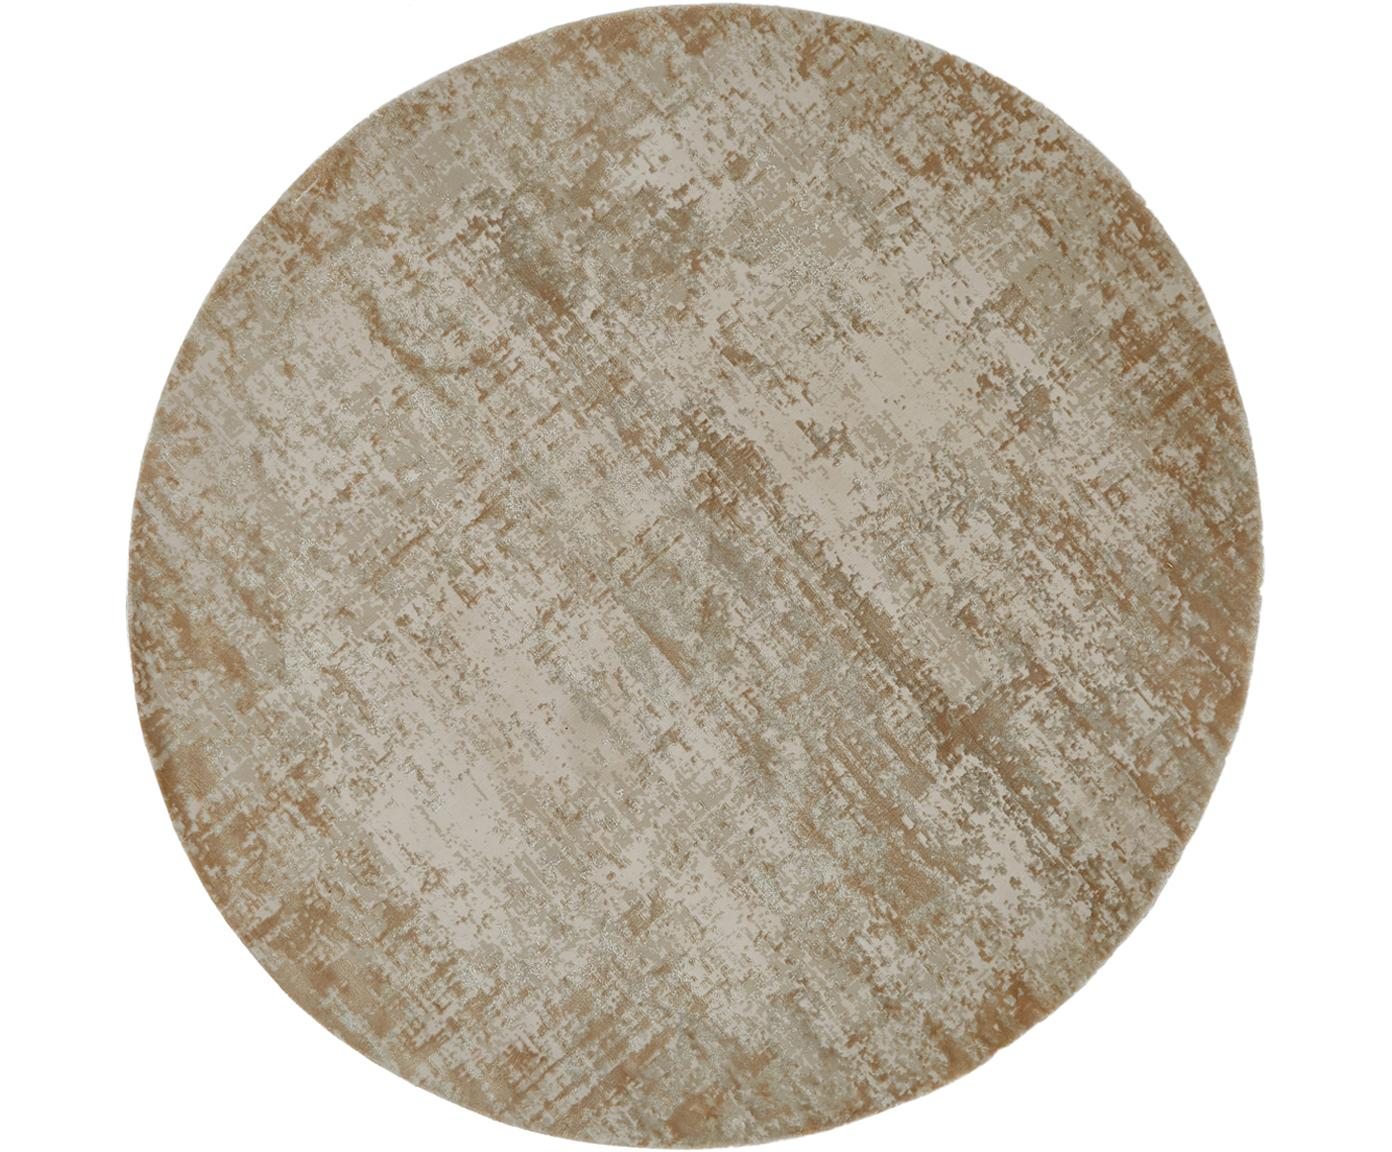 Alfombra redonda Cordoba, estilo vintage, Parte superior: 70%acrílico, 30%viscosa, Reverso: poliéster, Tonos beige, Ø 150 cm